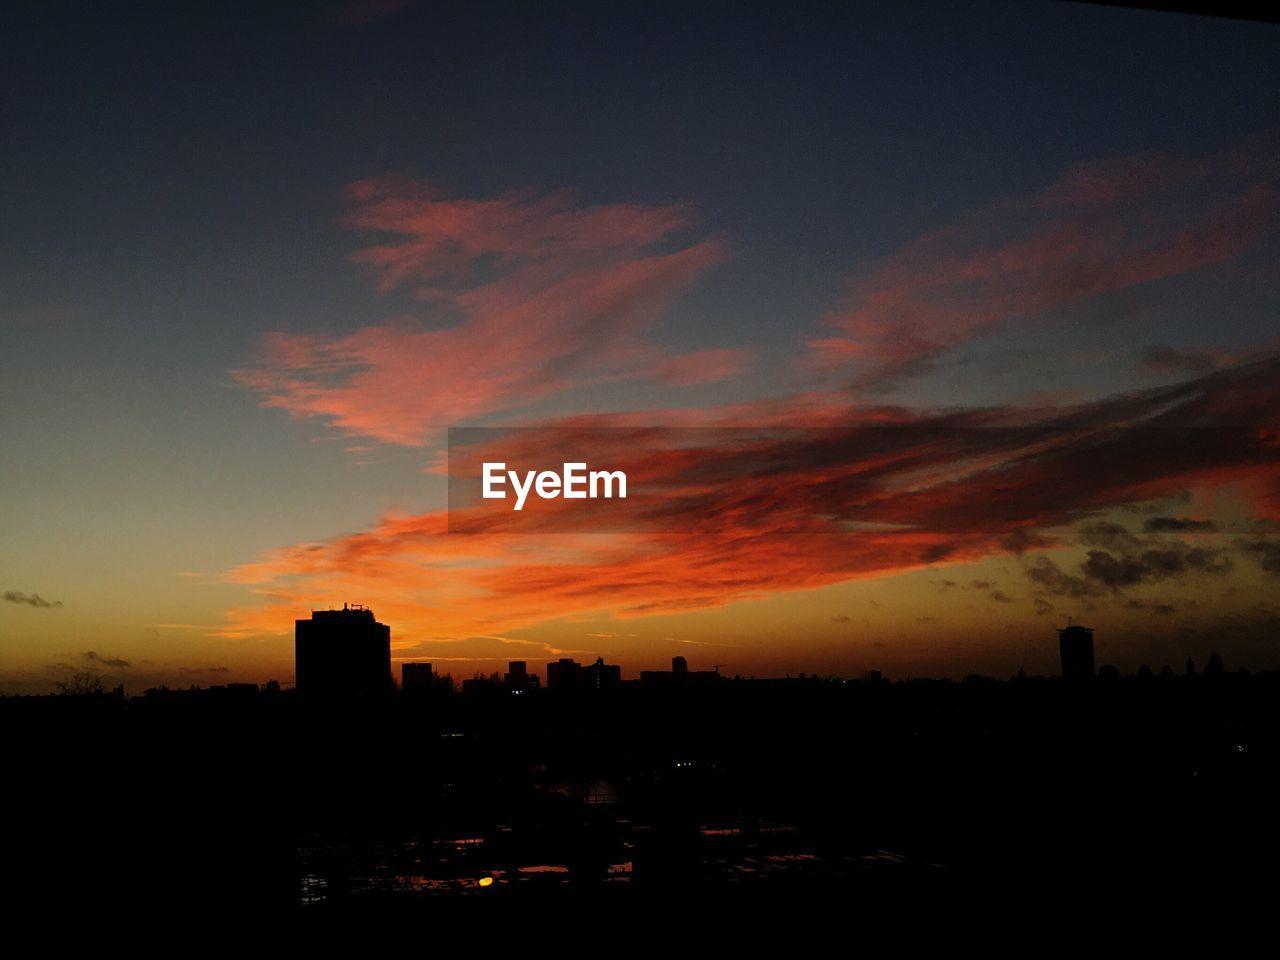 sunset, silhouette, sky, building exterior, architecture, orange color, cloud - sky, cityscape, built structure, city, no people, skyscraper, nature, outdoors, travel destinations, beauty in nature, scenics, urban skyline